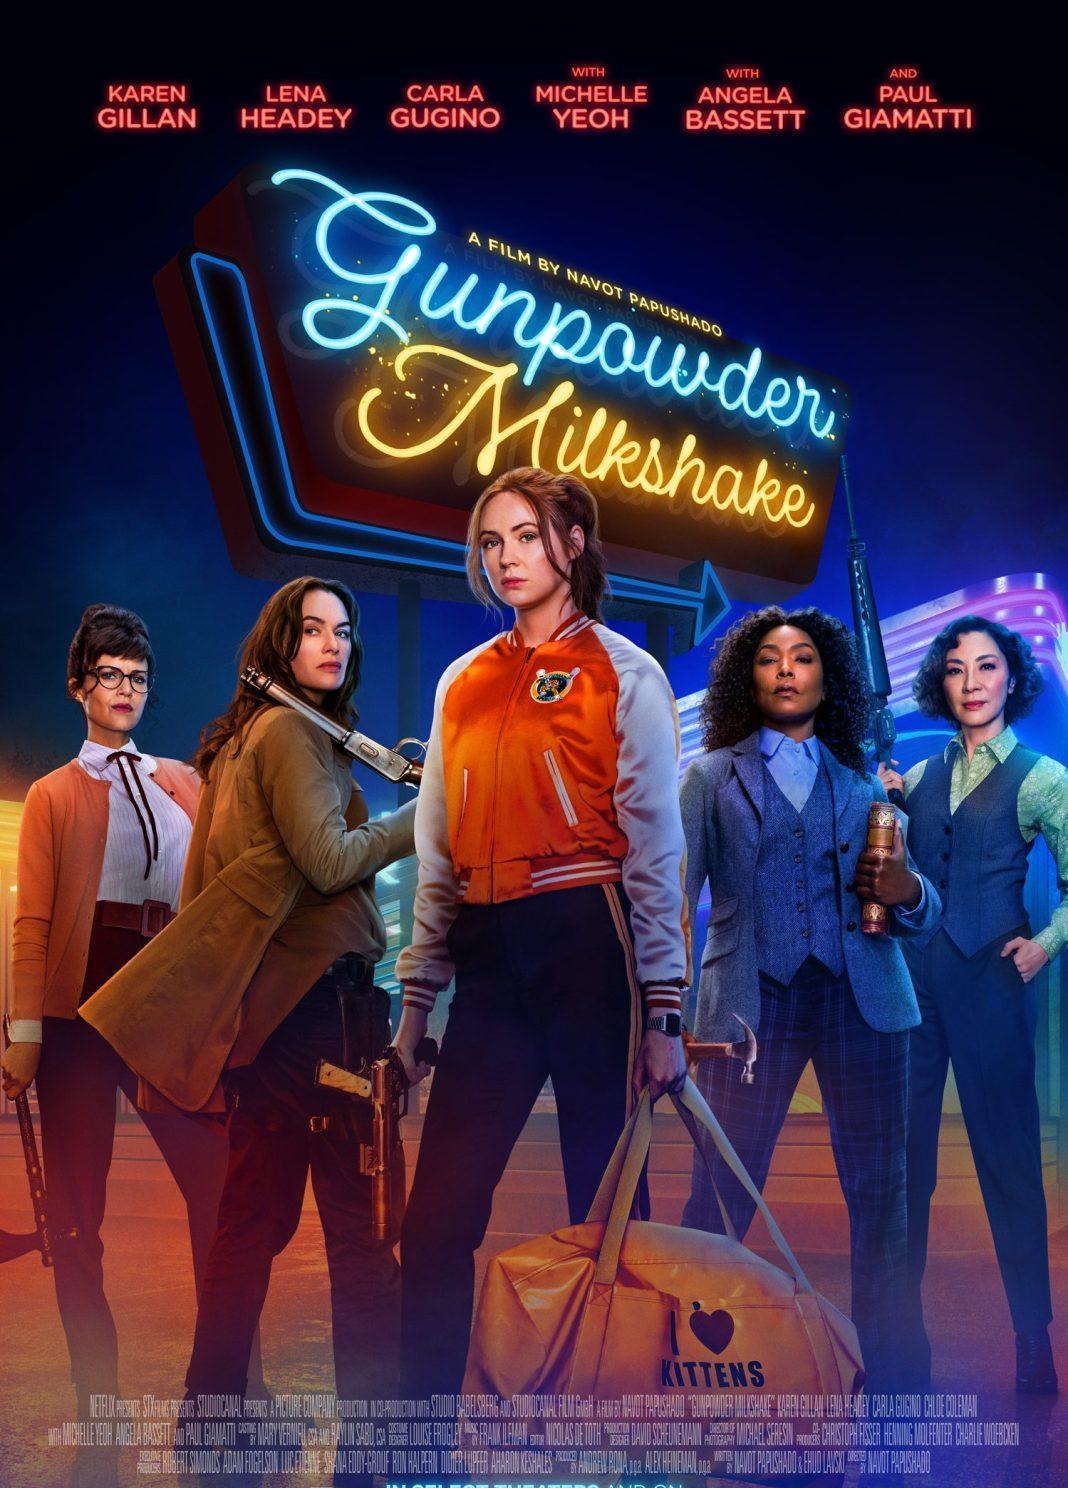 Gunpowder Milkshake, starring Karen Gillan (c) StudioCanal/Netflix Lena Headey, Carla Gugino, Angela Bassett, Michelle Yeoh